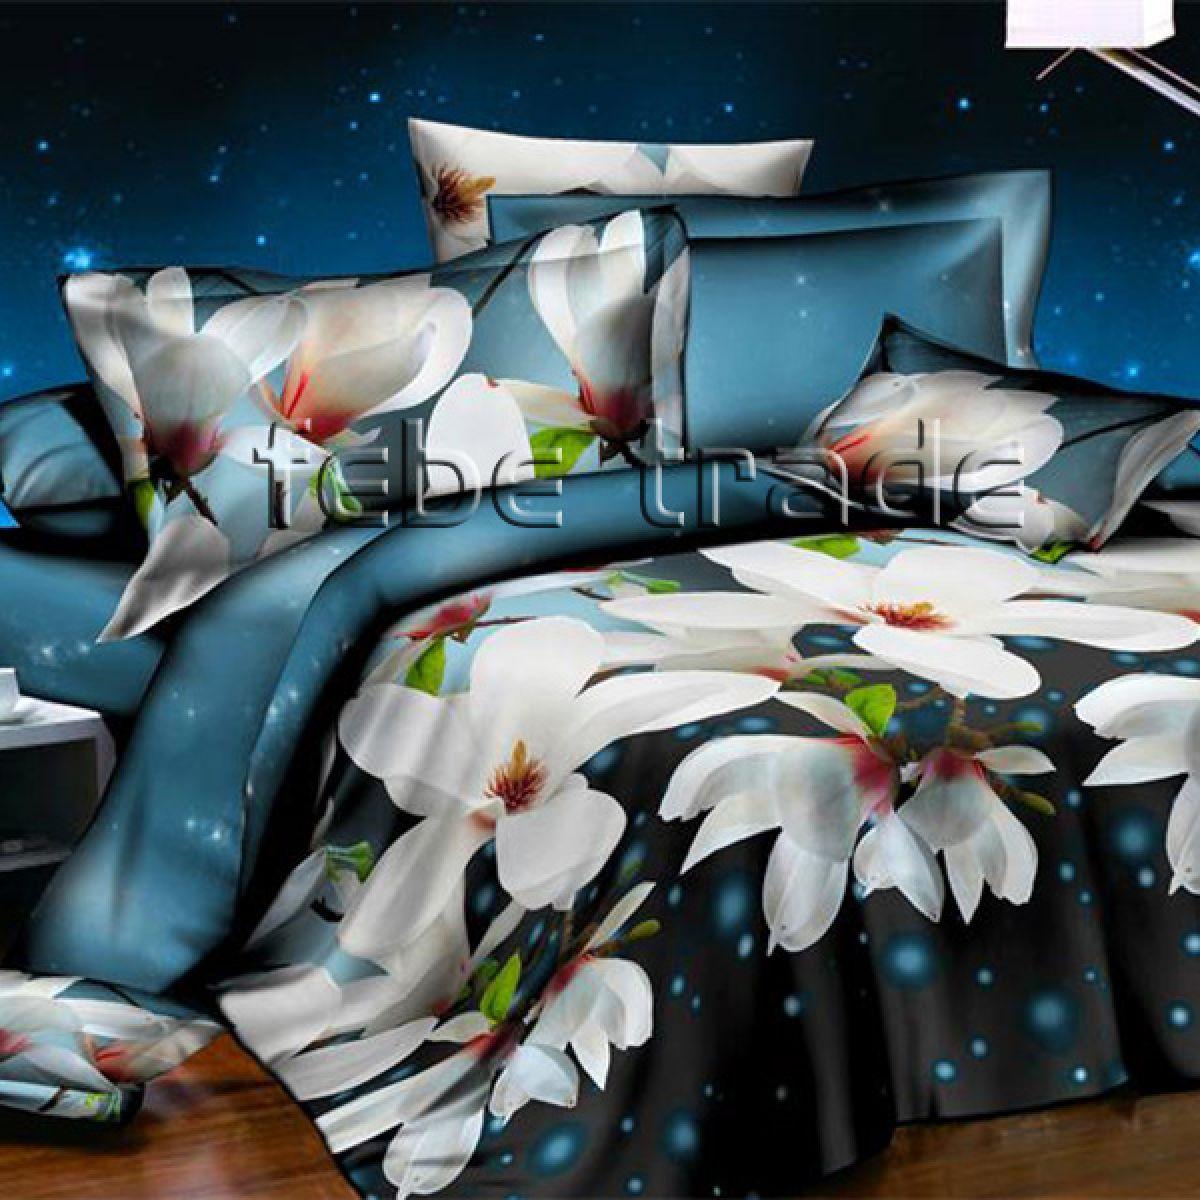 3D Beddings Plush - Cotton World - FSB-804 - 160x200 cm - 4 pcs